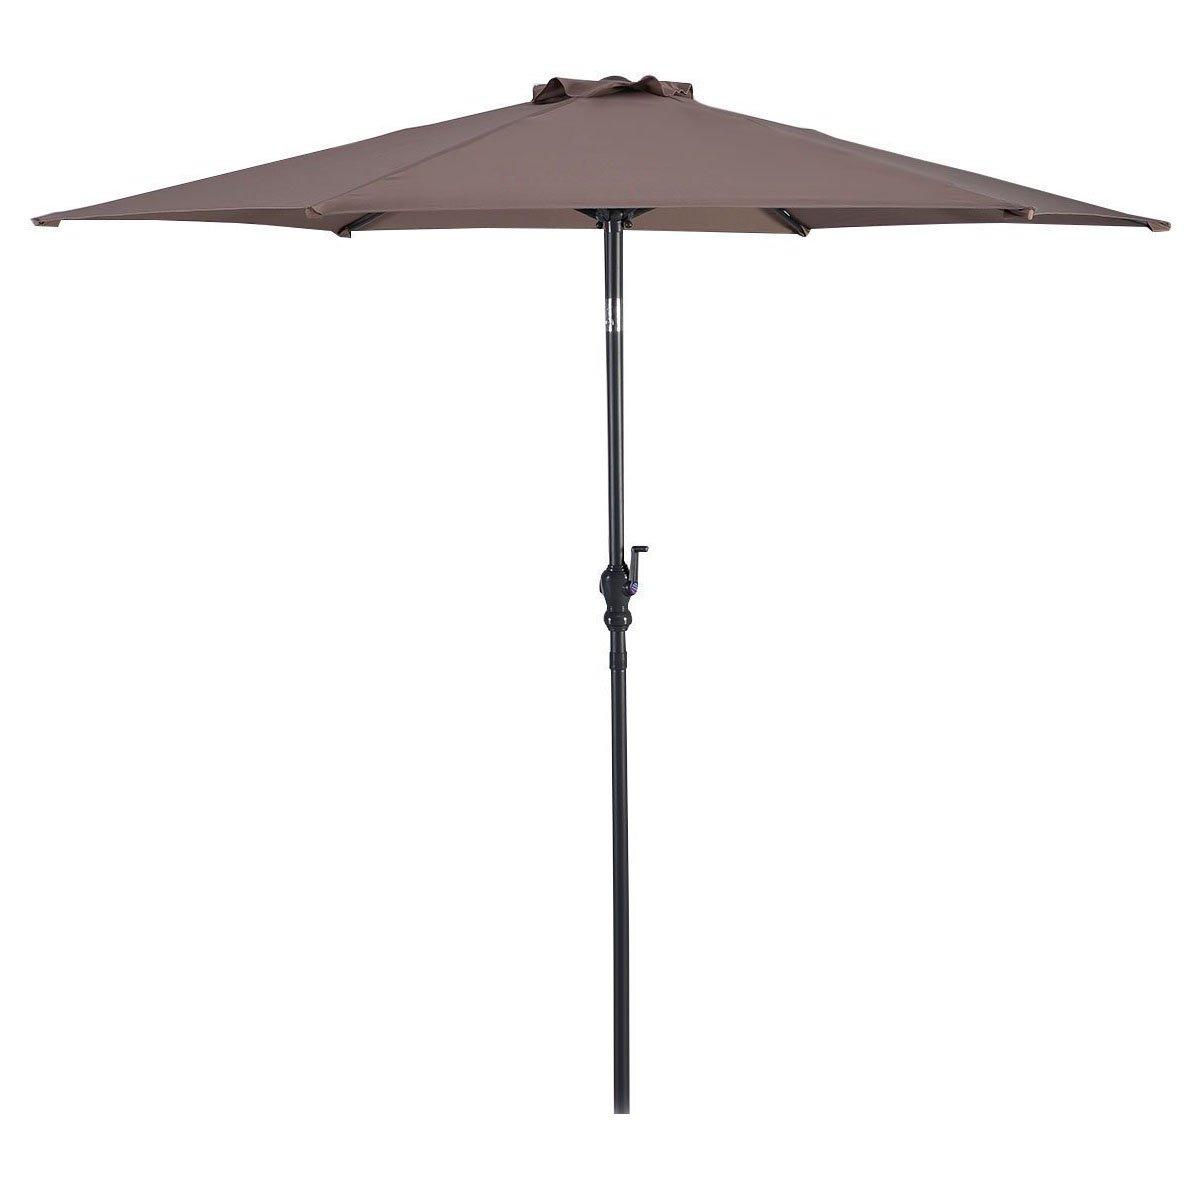 Giantex 10ft Solar Patio Umbrella Sunbrella Without LED Lighted, 6 Ribs Market Steel Tilt w/Crank for Garden, Deck, Backyard, Pool Indoor Outdoor Use, Tan